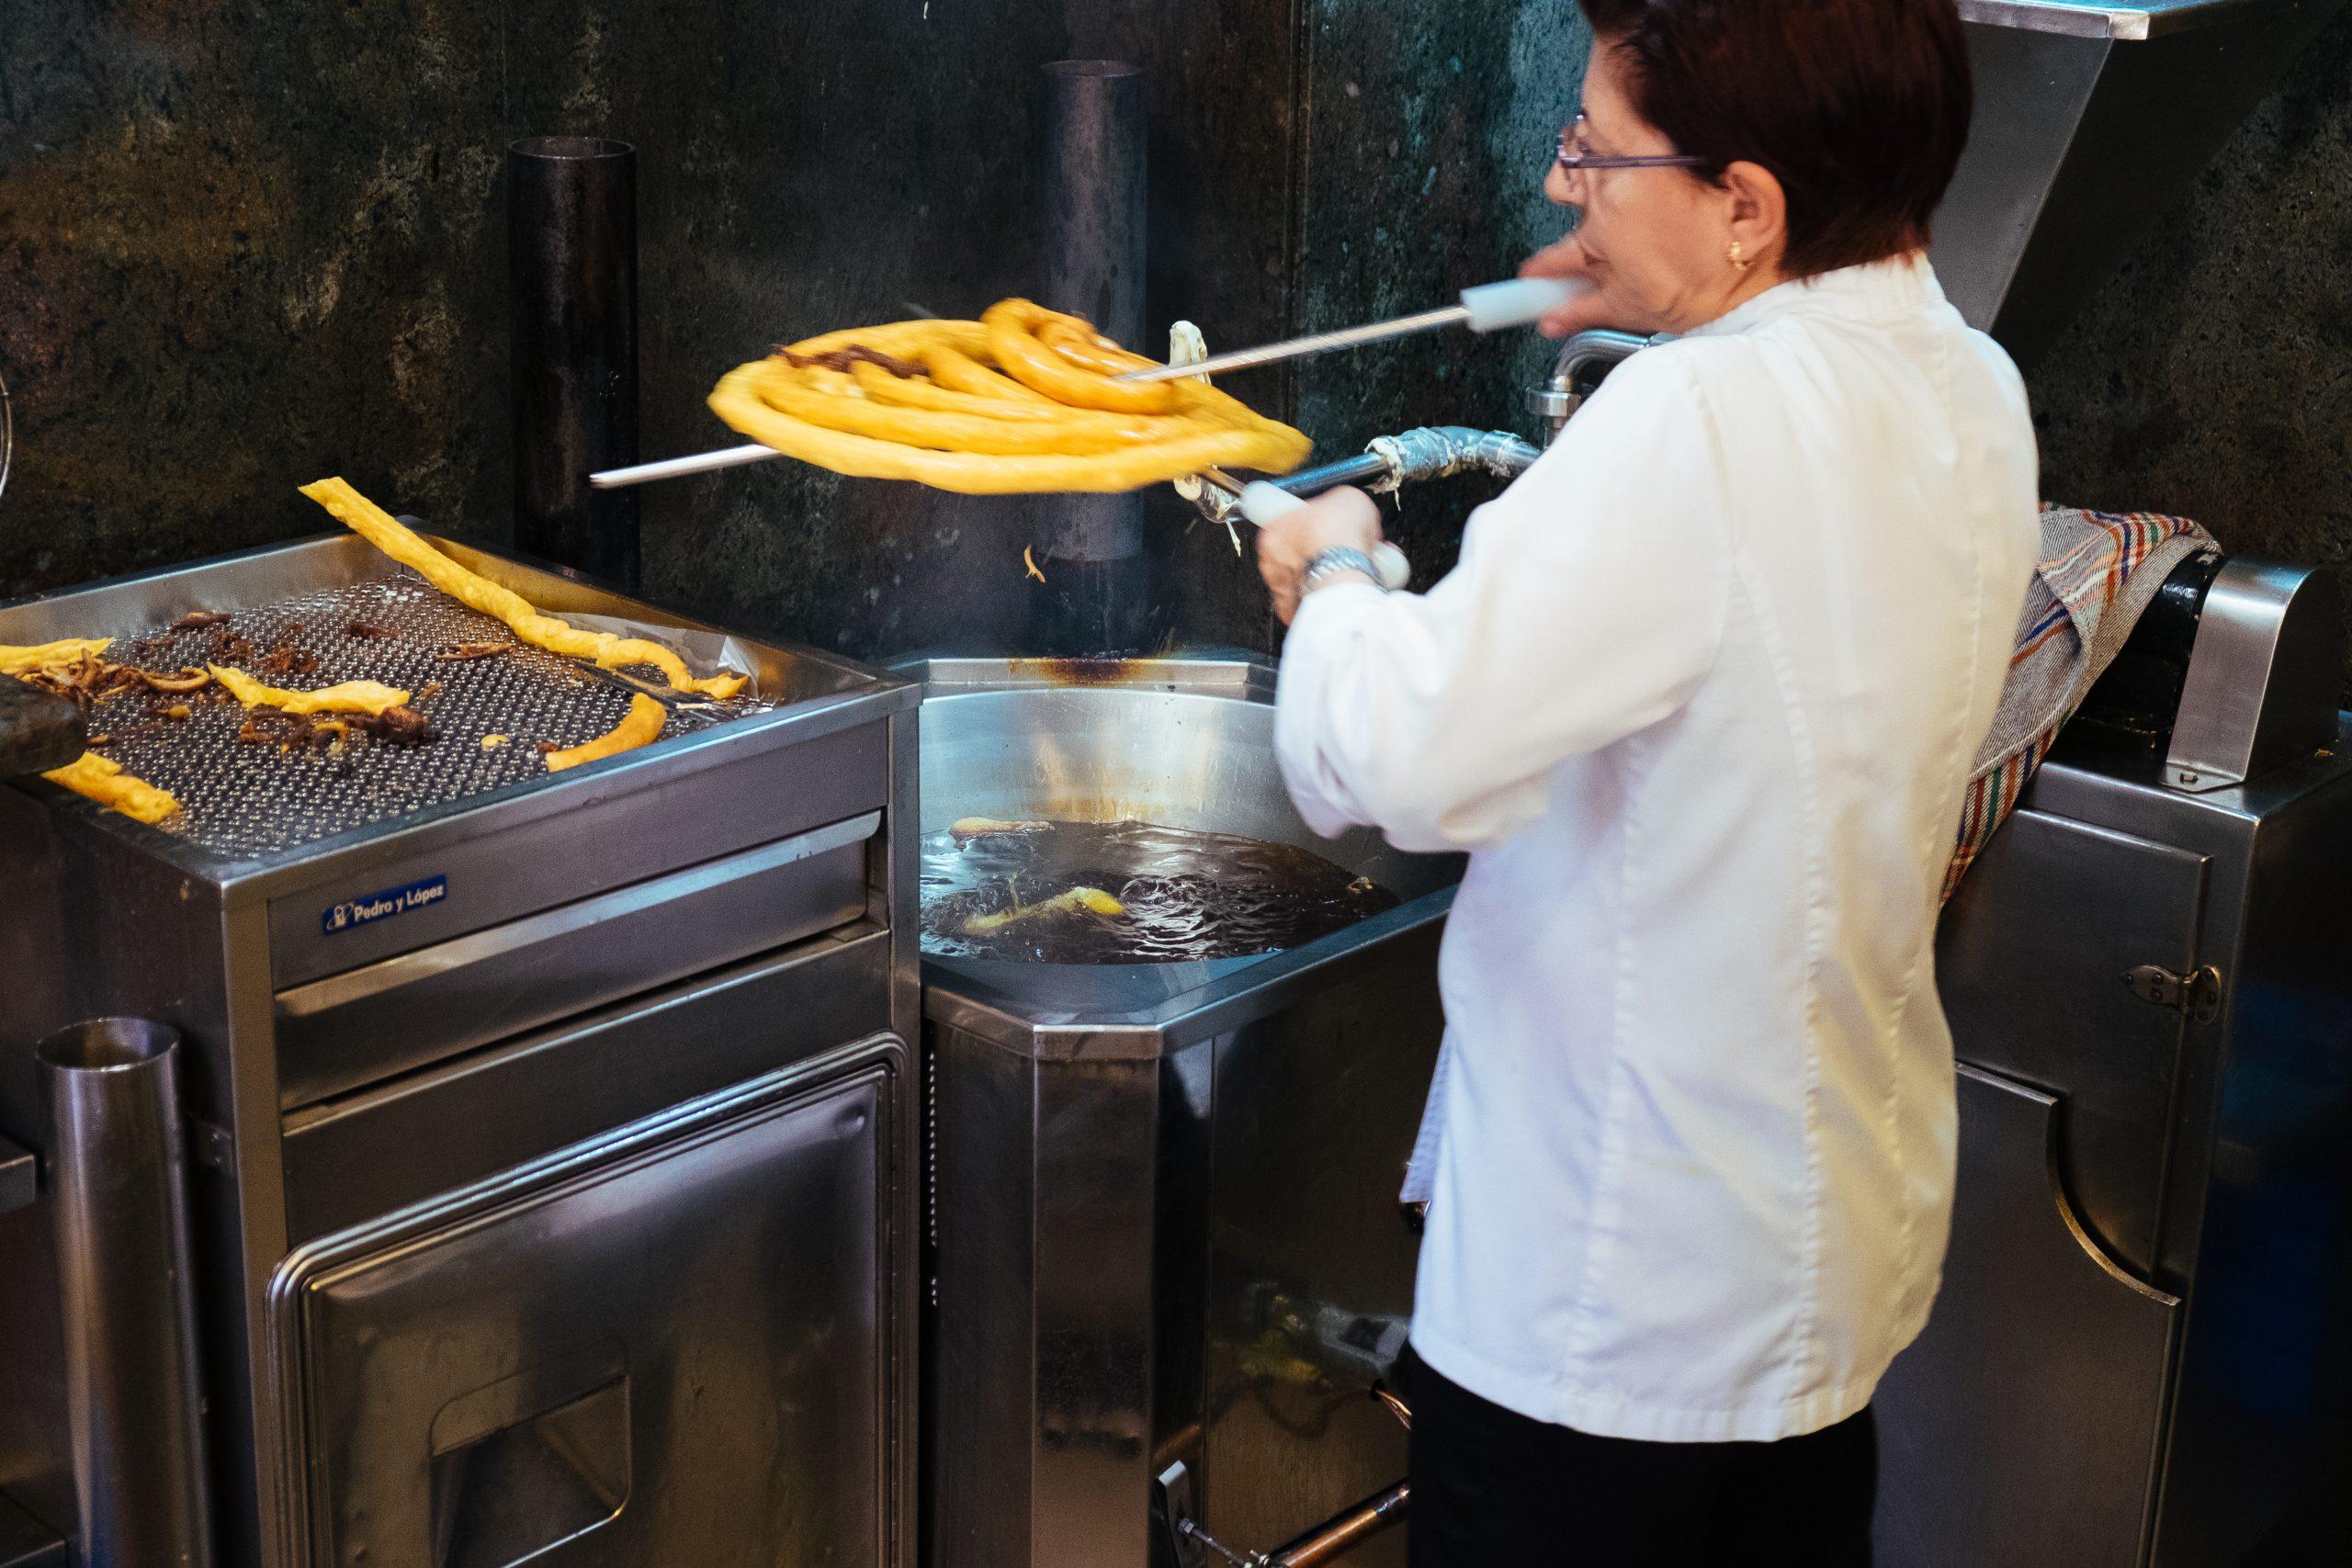 Granada: ontbijt met churros in Grand Café Bib Rambla - andalucië